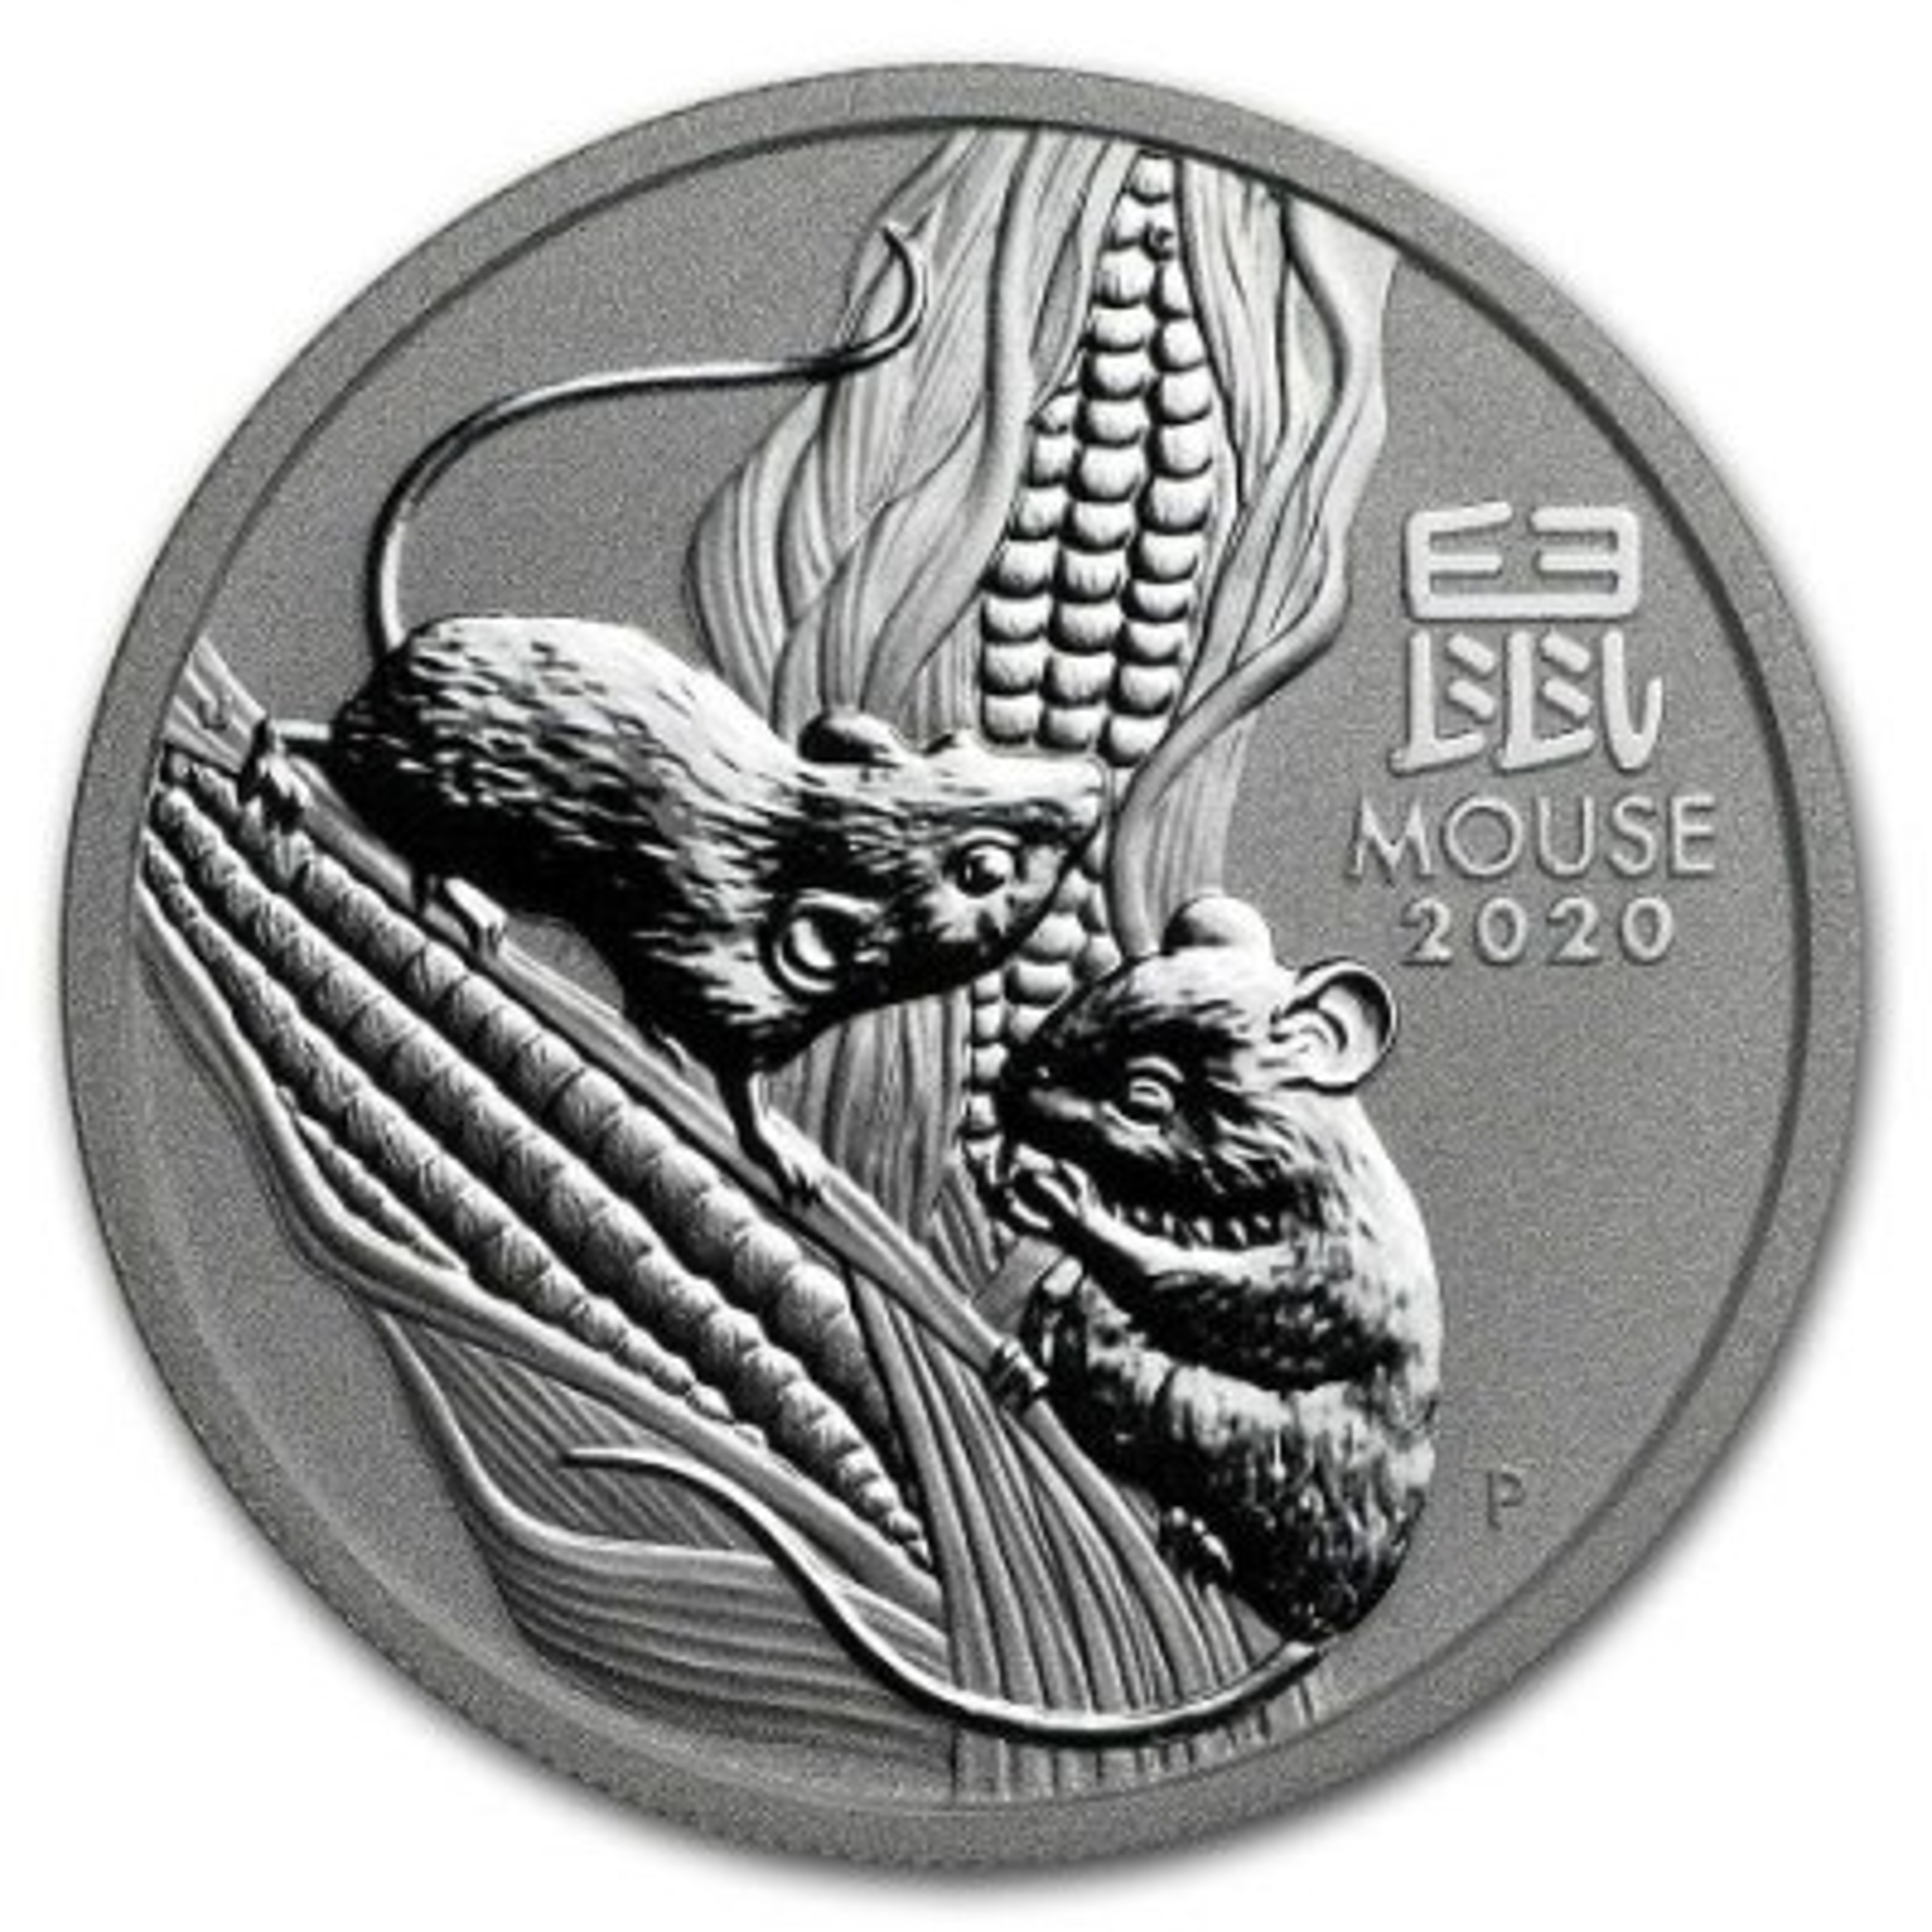 1/2 Troy ounce zilveren munt Lunar 2020 - voorkant